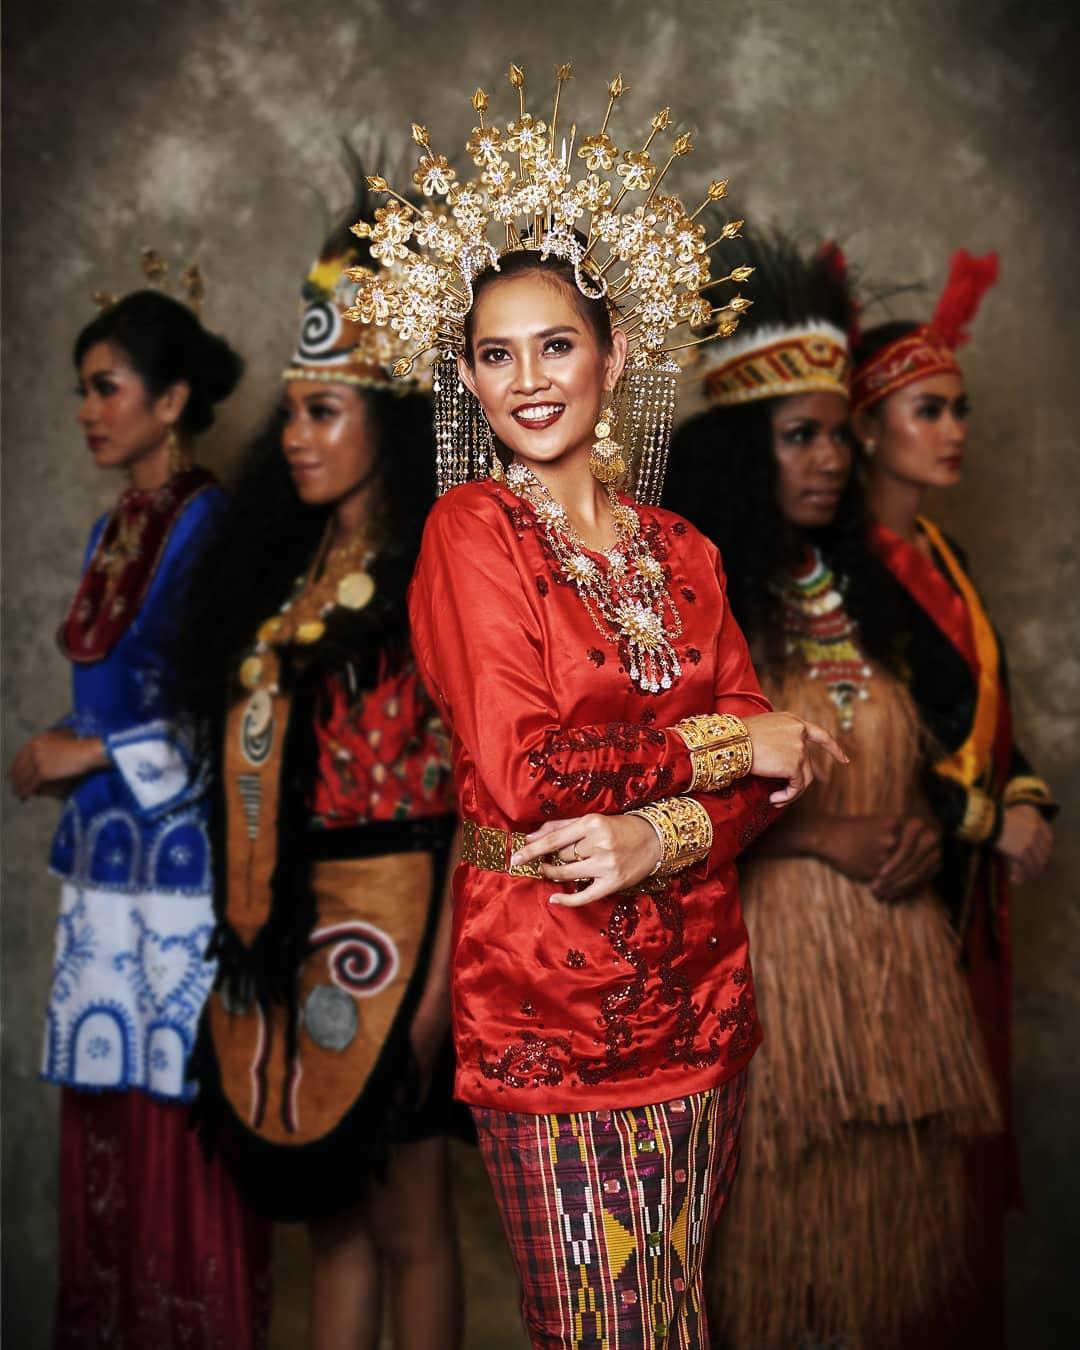 Baju adat Indonesia - Finalis Puteri Indonesia asal Sulawesi Tenggara 2